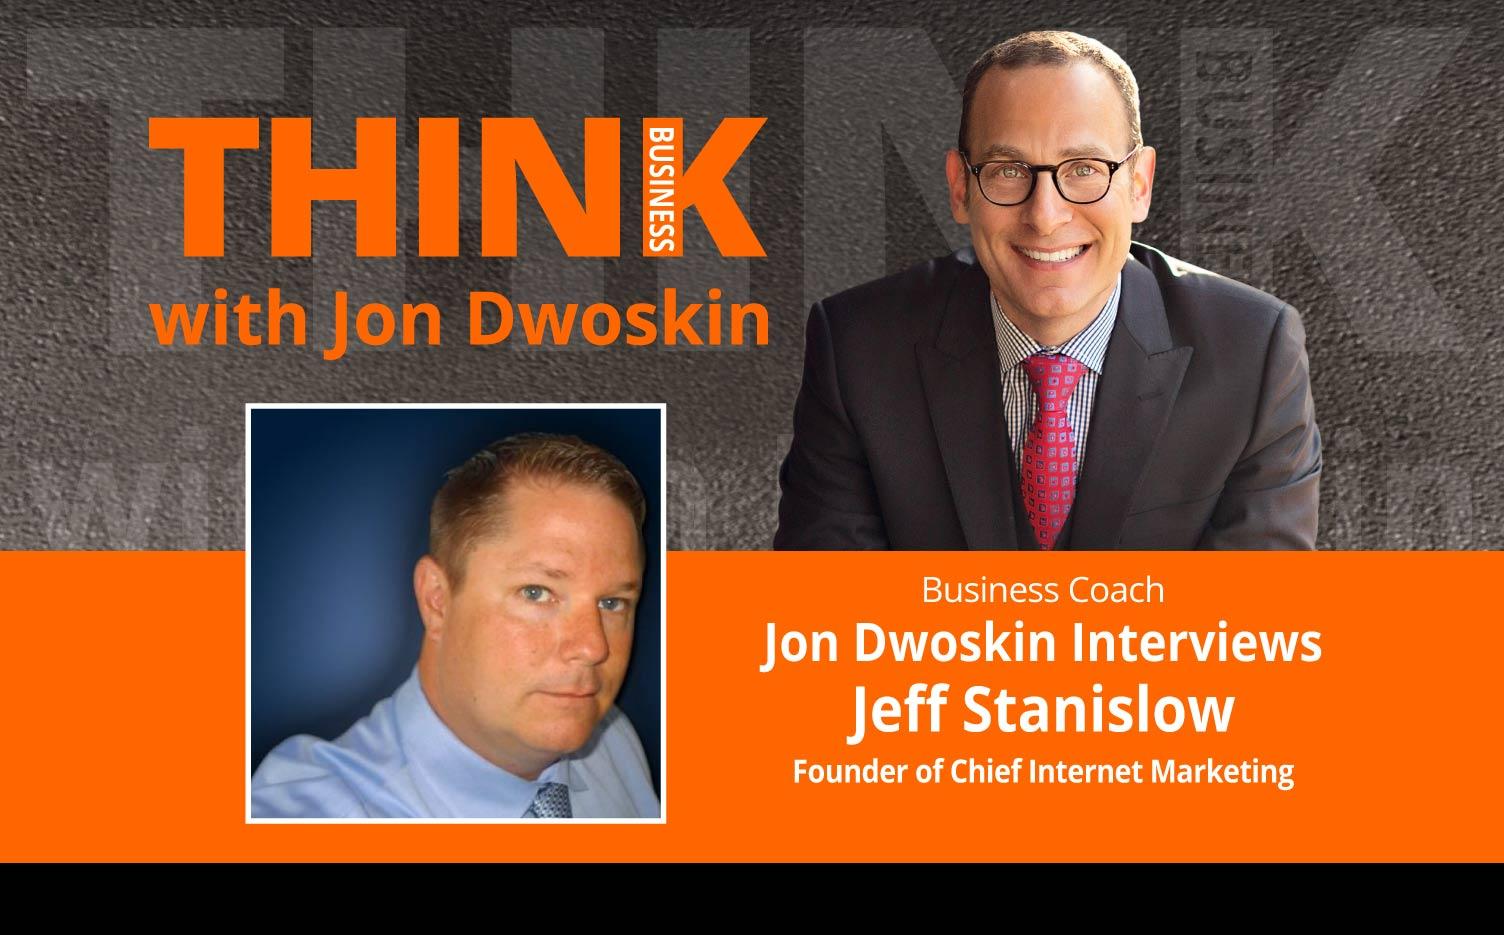 THINK Business: Jon Dwoskin Interviews Jeff Stanislow, Founder of Chief Internet Marketing